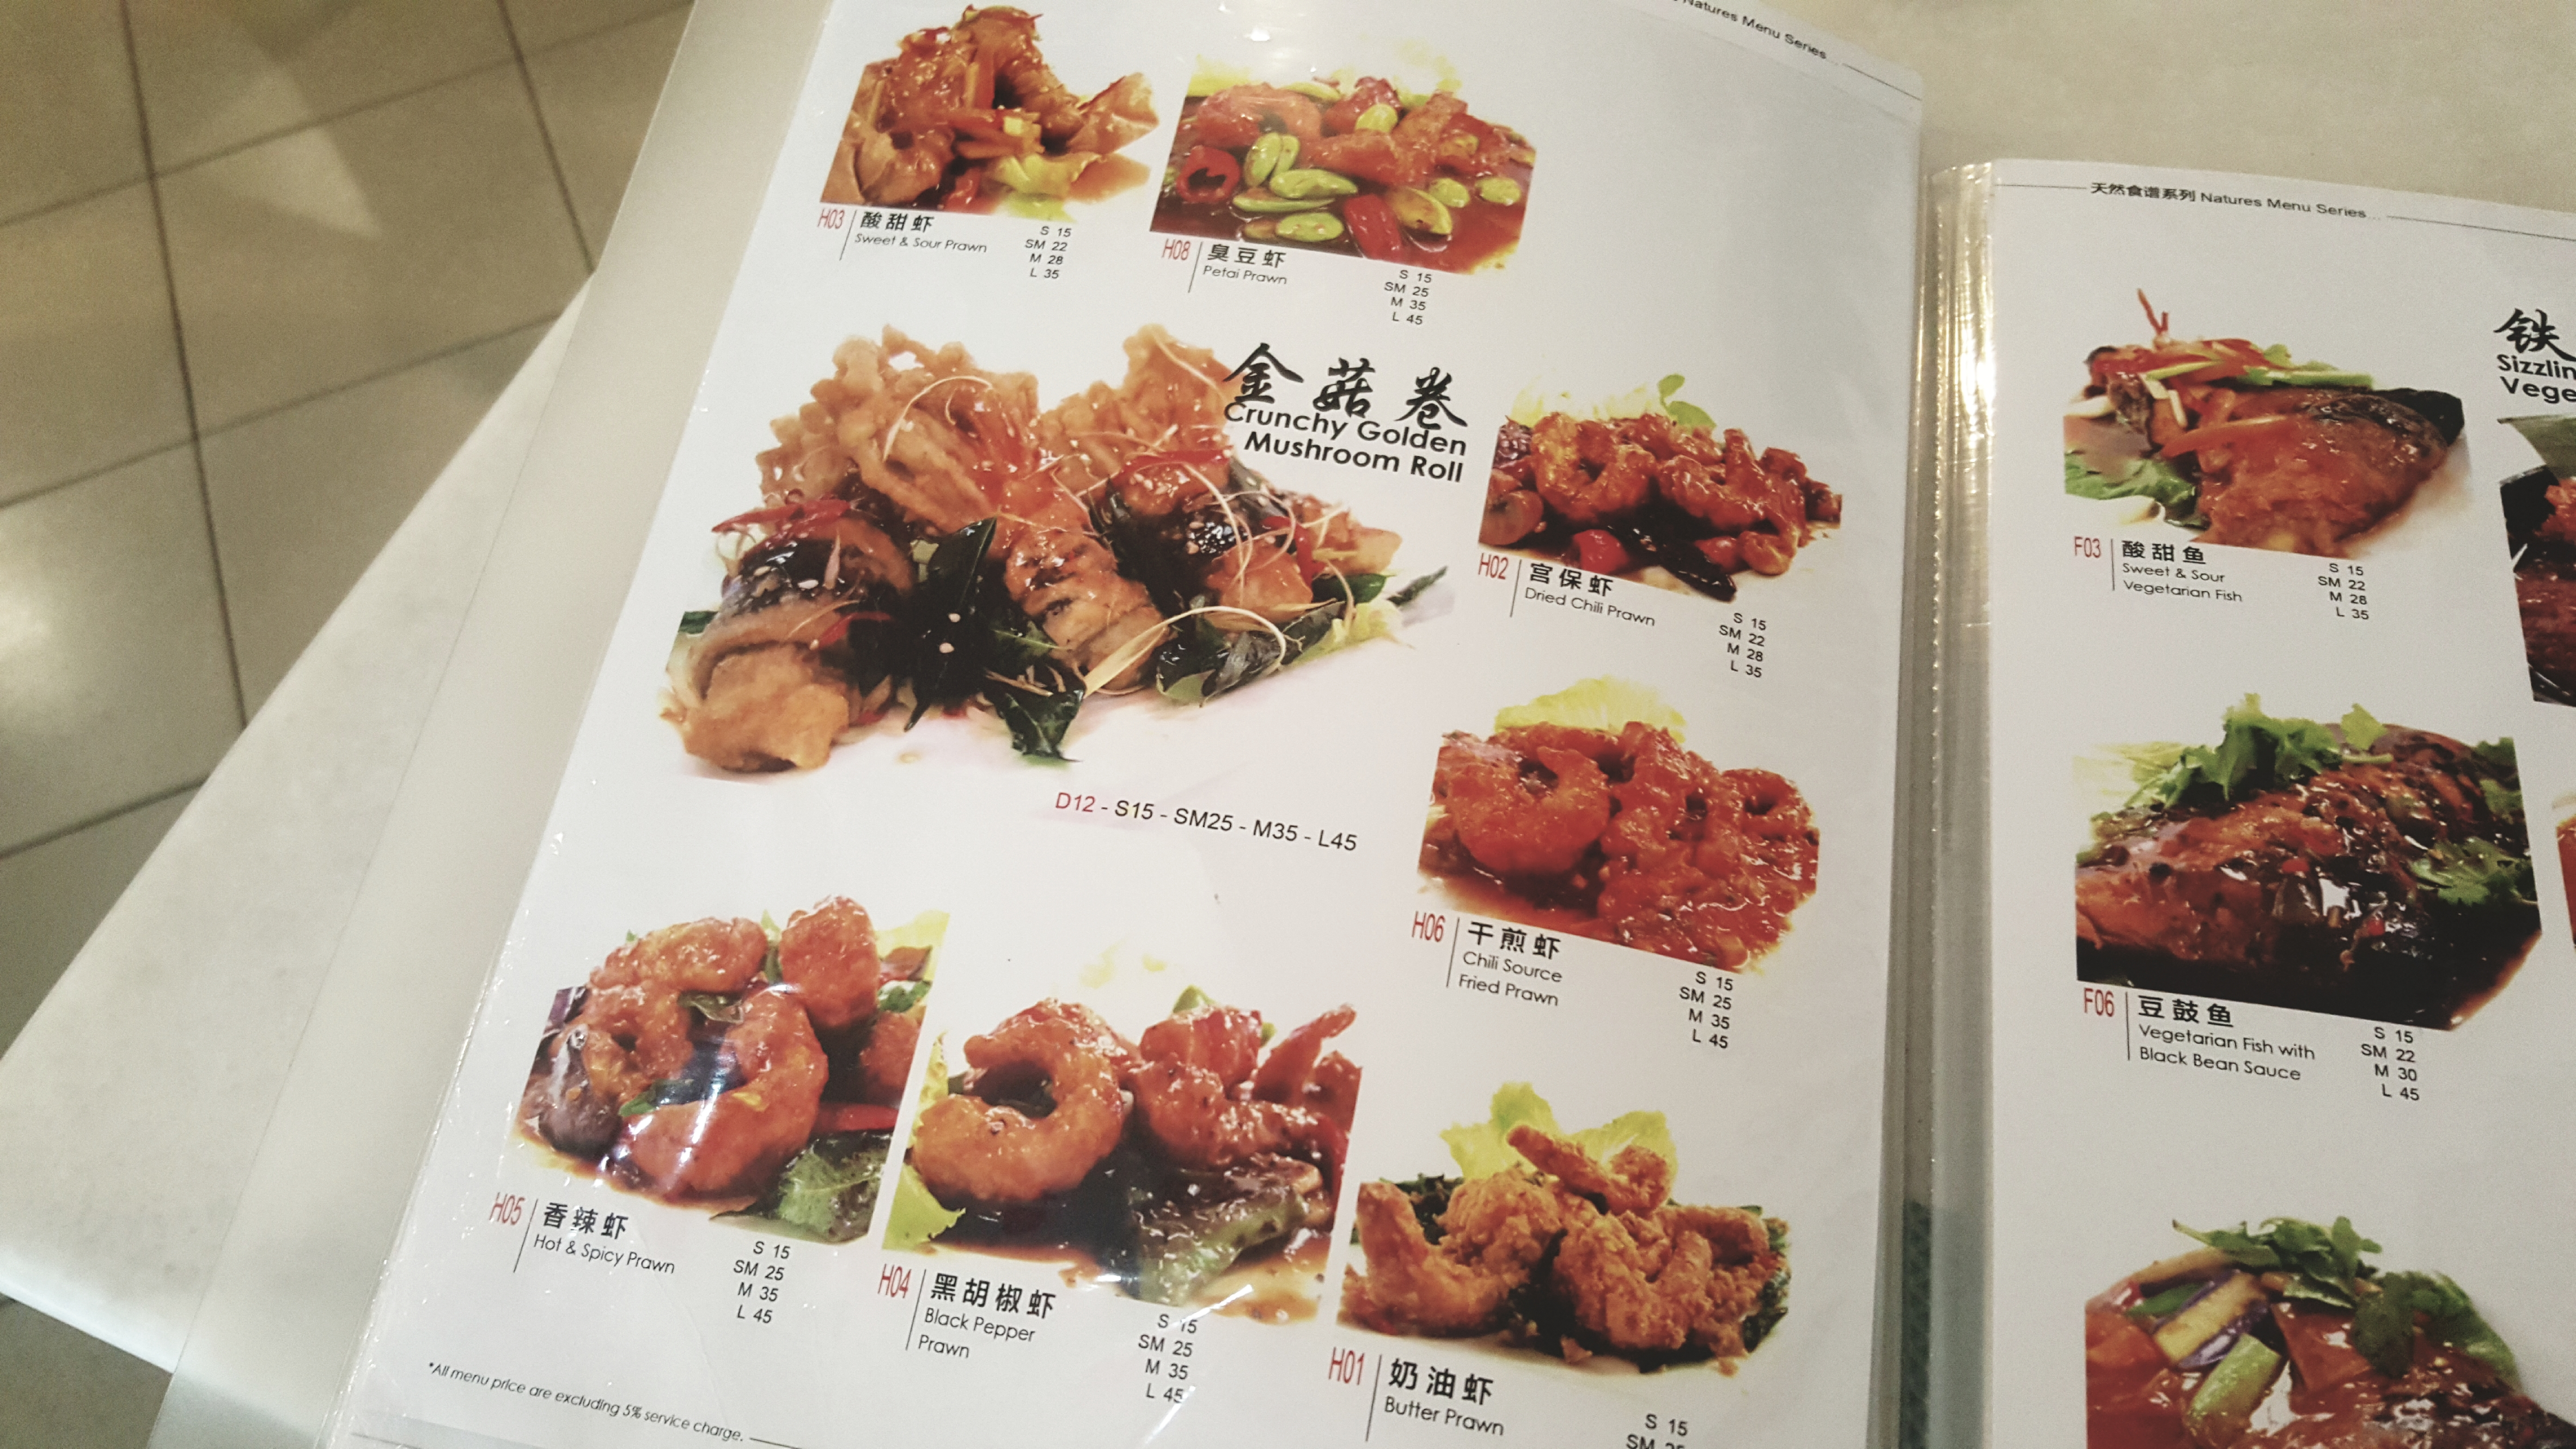 Nature's Vegetarian Restaurant @ PJS 8 – I loveeee meat but